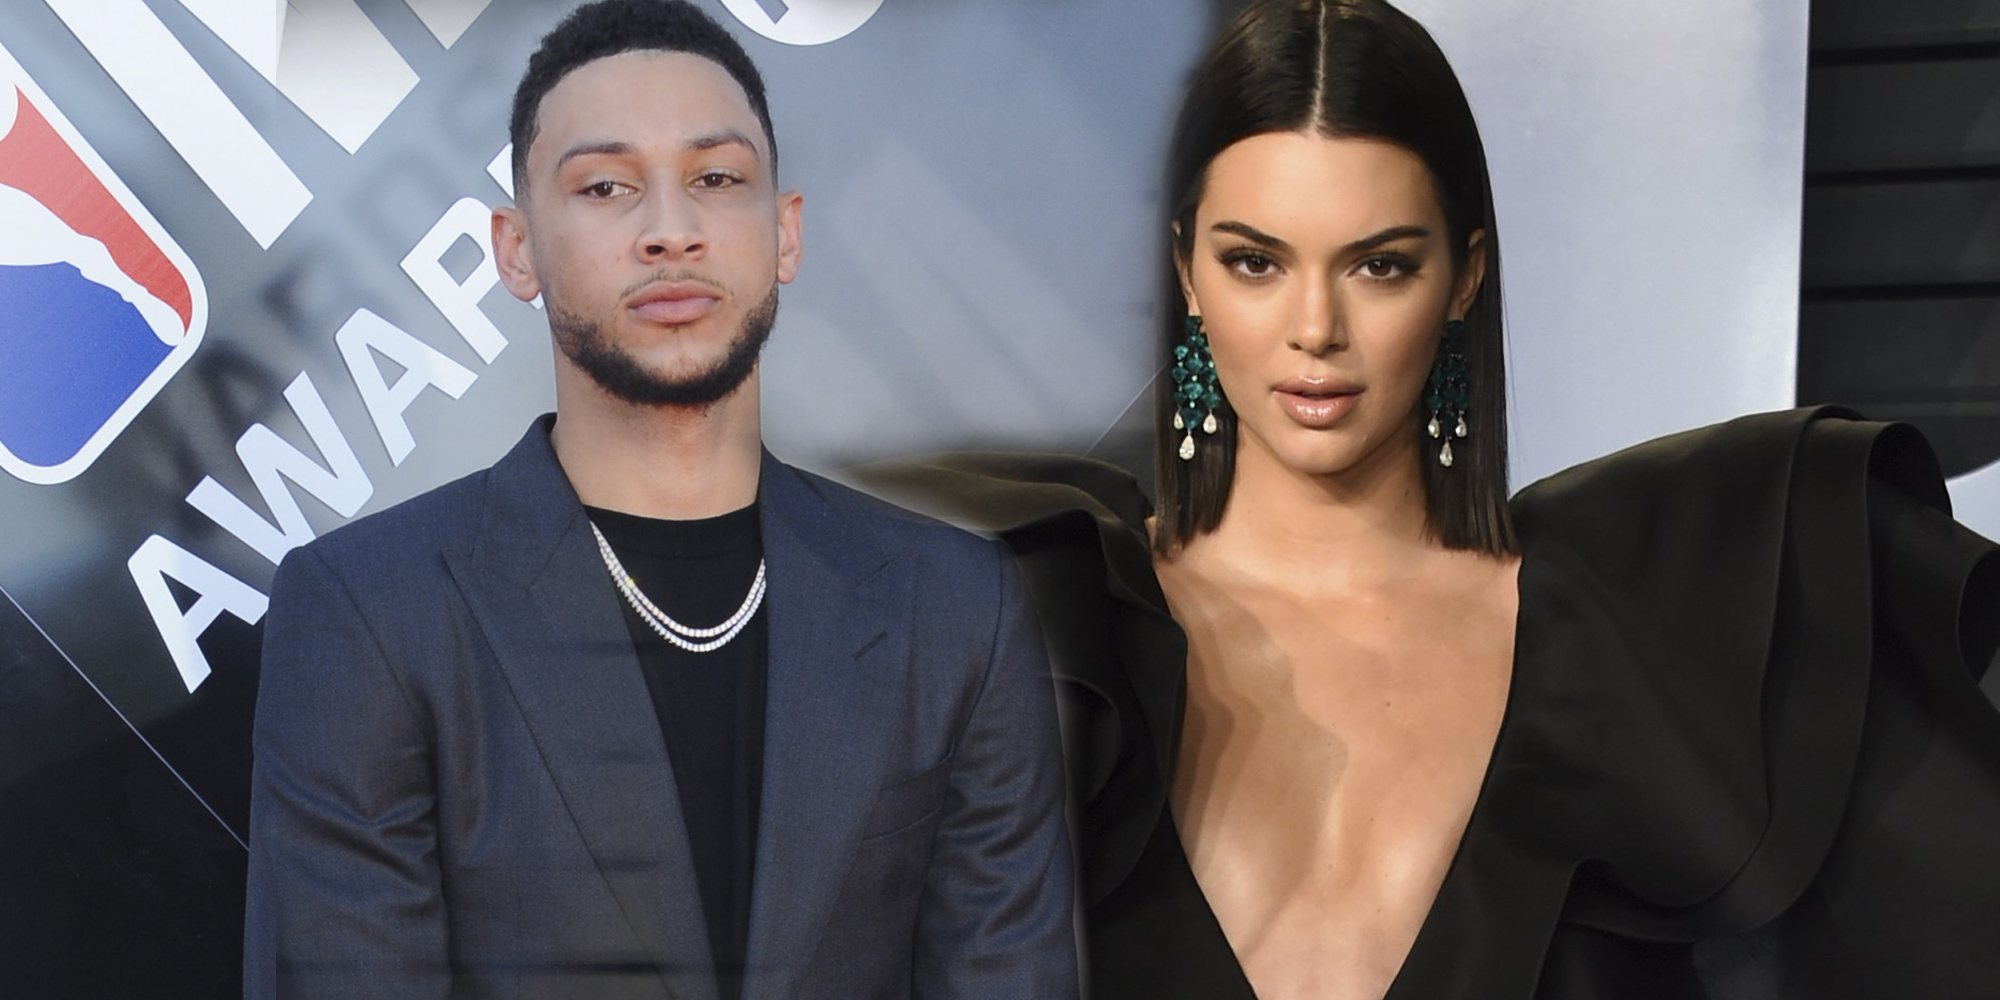 Un fan del equipo de Bean Simons pide vetar a Kendall Jenner en la NBA para evitar la 'maldición Kardashian'